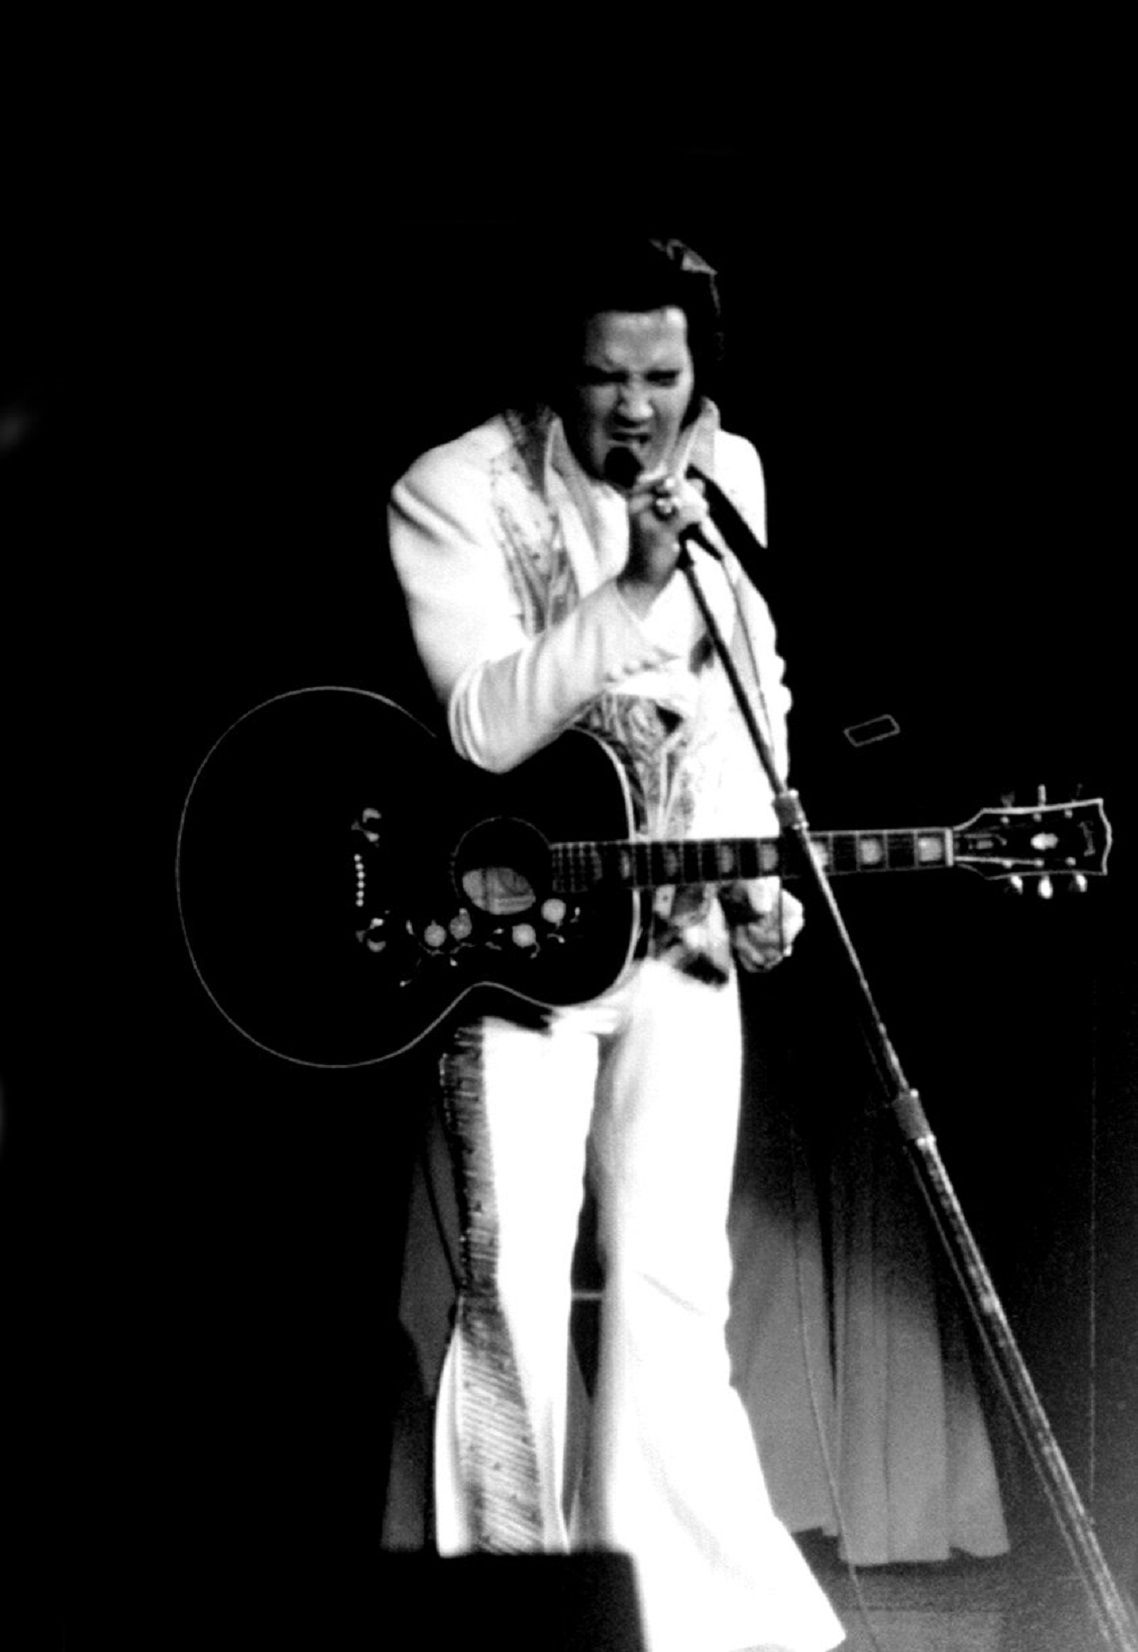 ELVIS ON STAGE IN 1974